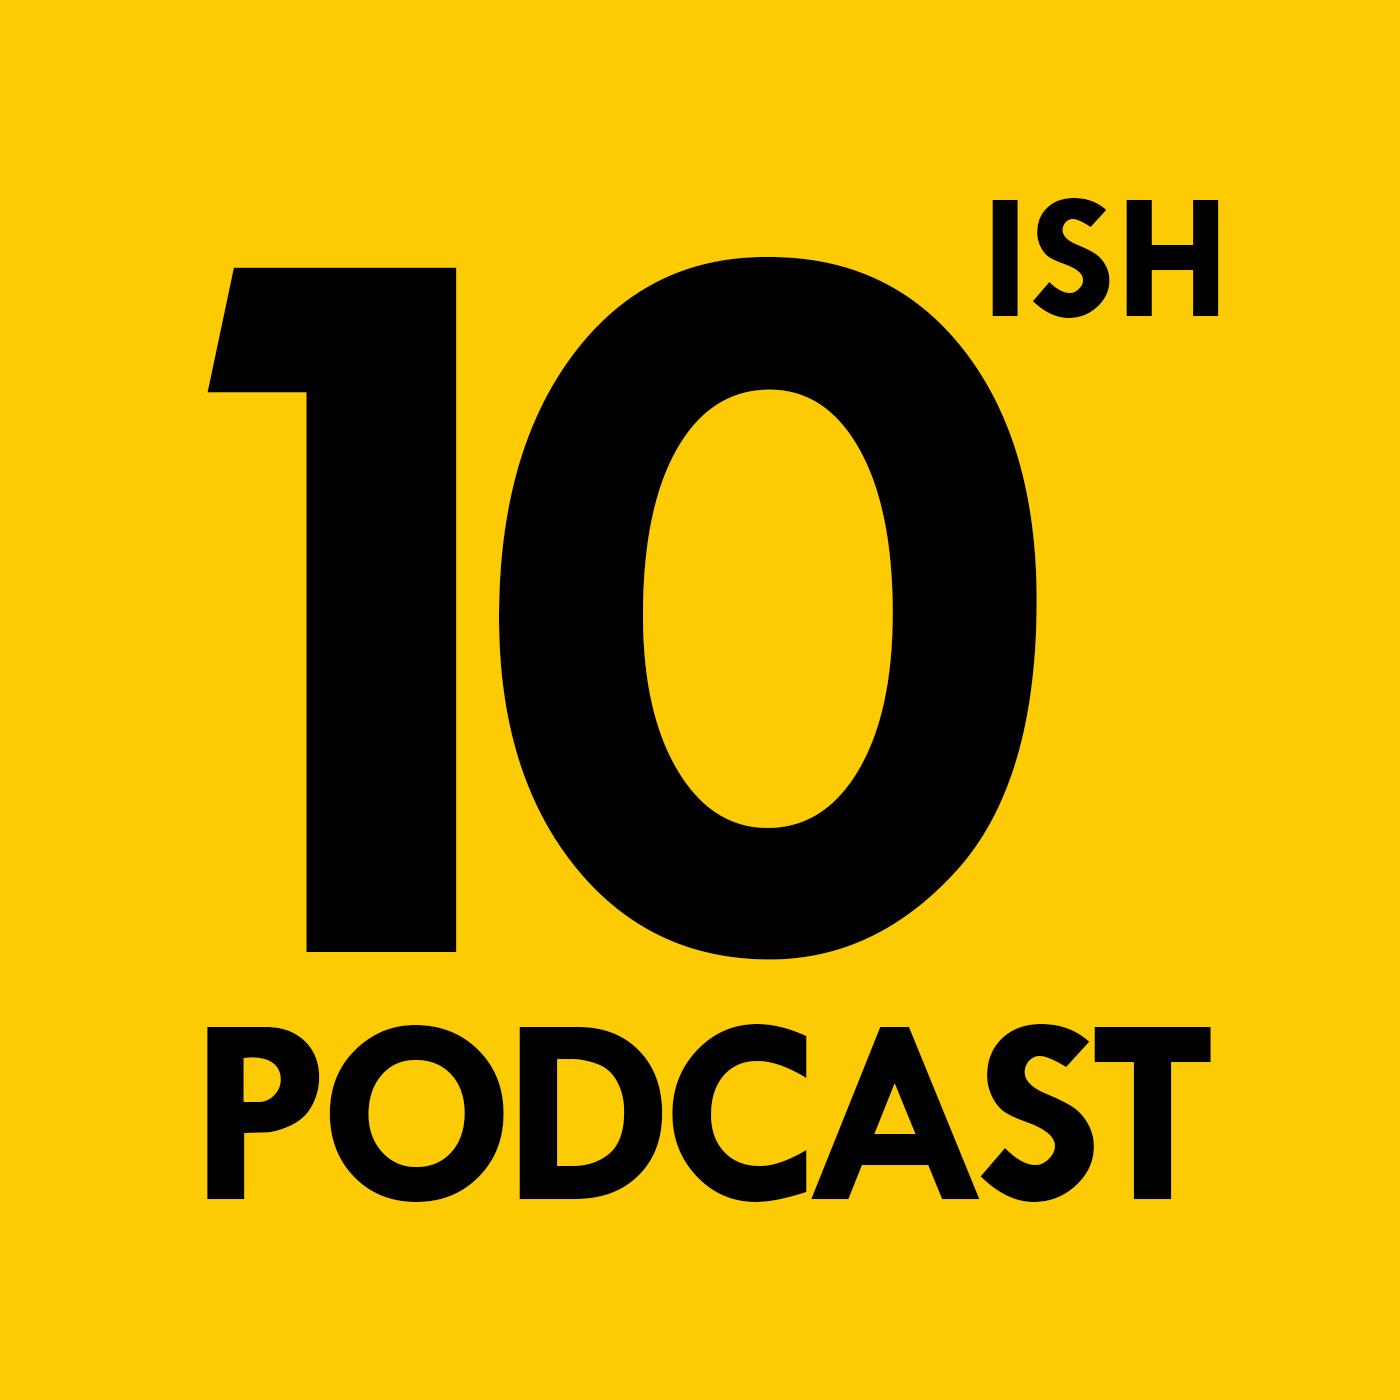 10ish podcast logo